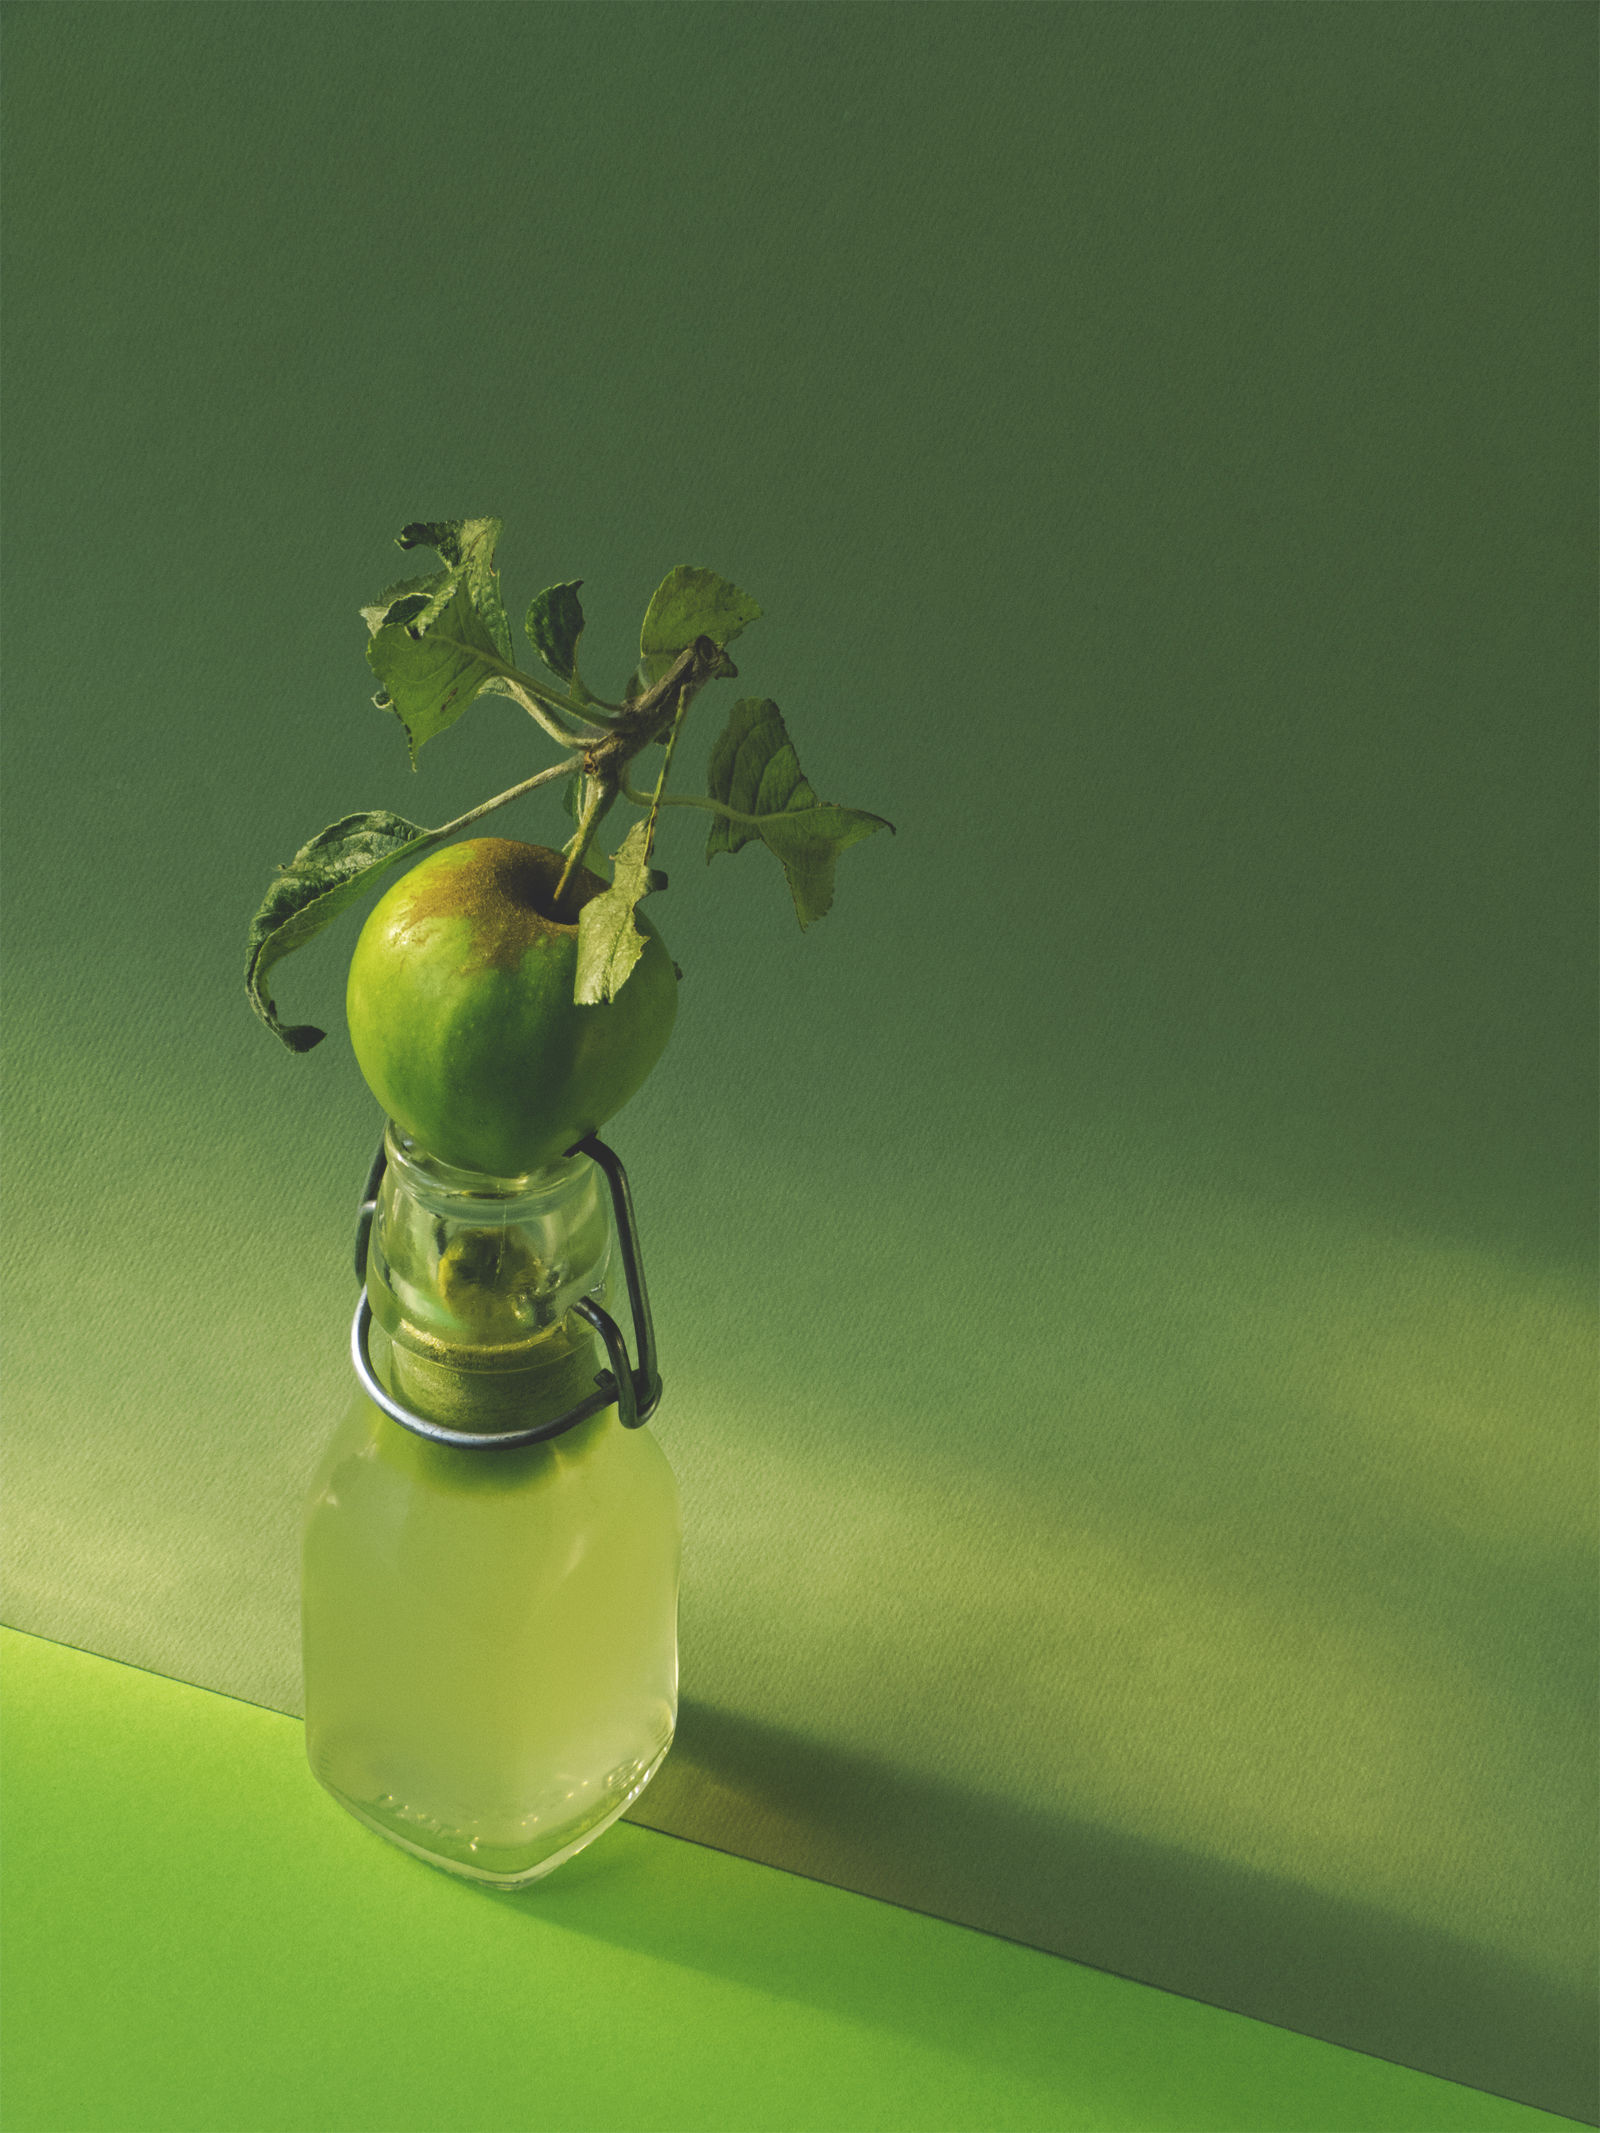 Apple_cork#5_FOODISM360.jpg